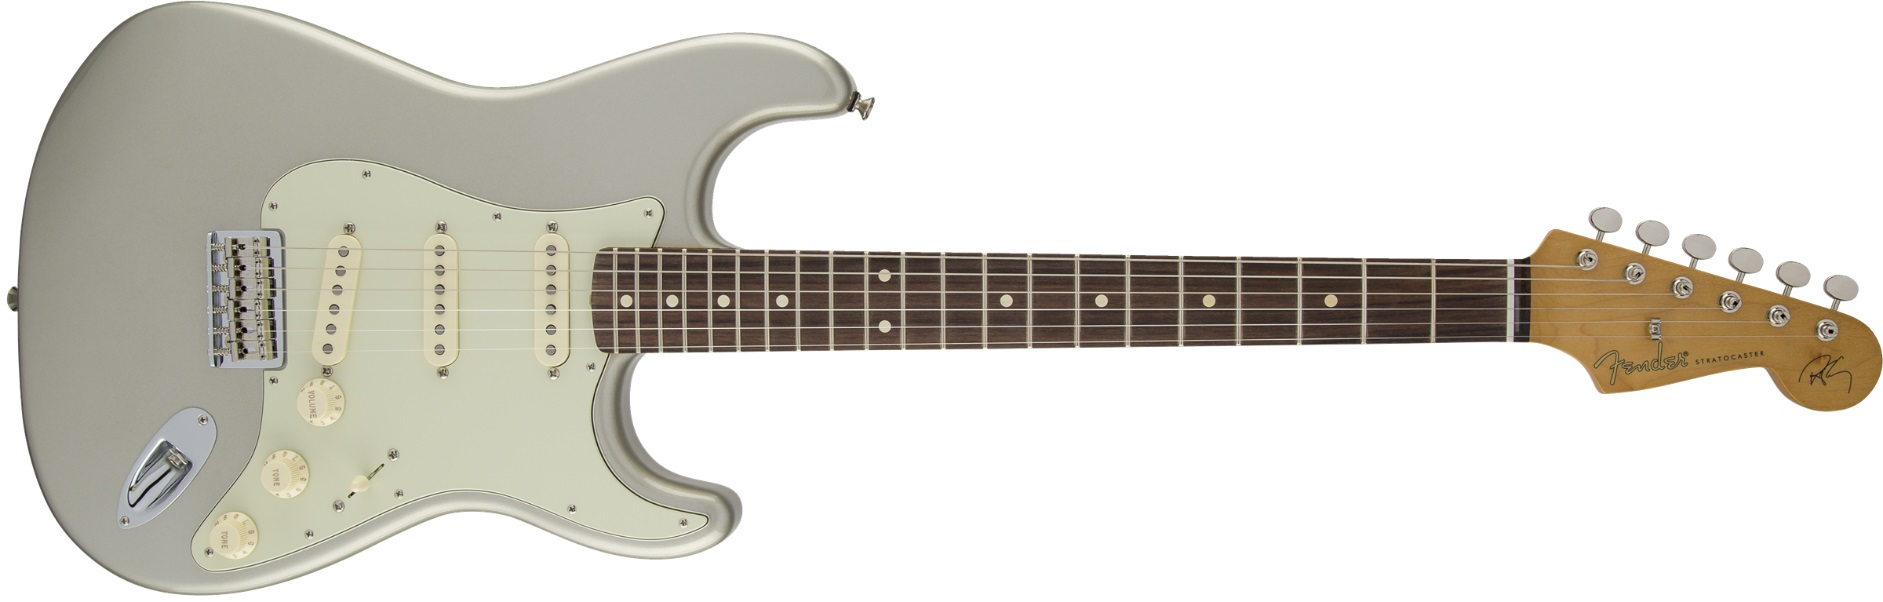 Fender Robert Cray Standard Stratocaster RW IS